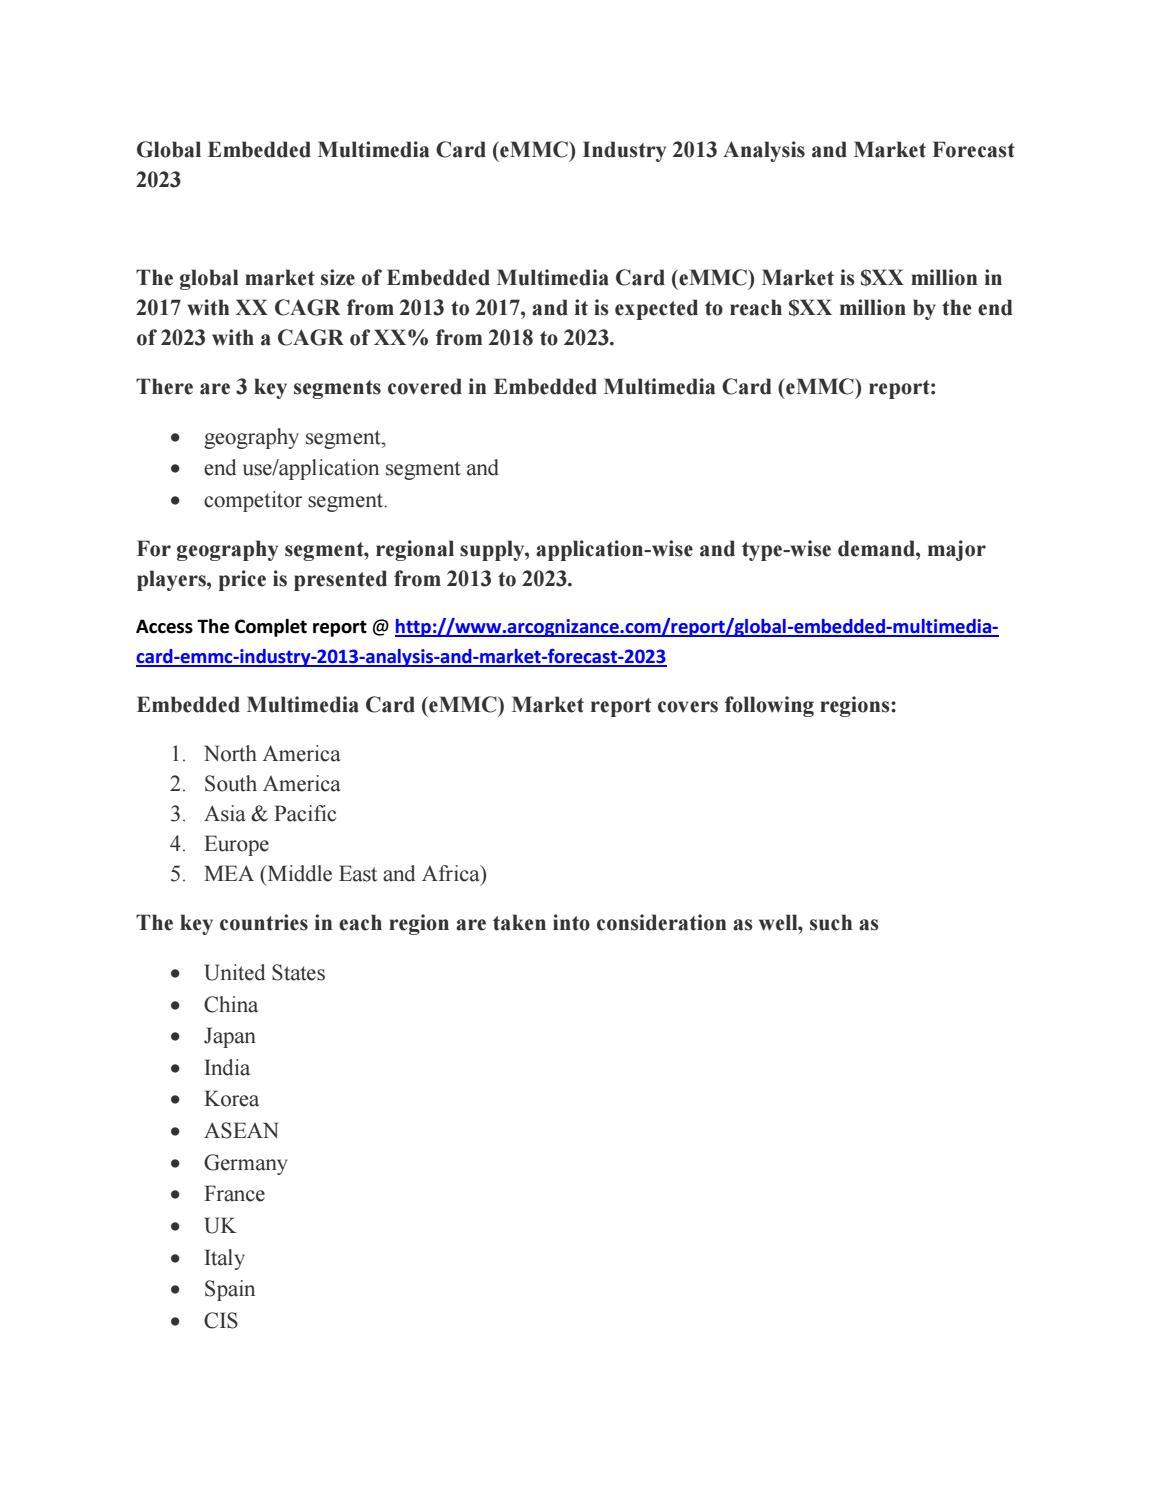 Global embedded multimedia card (emmc) industry 2013